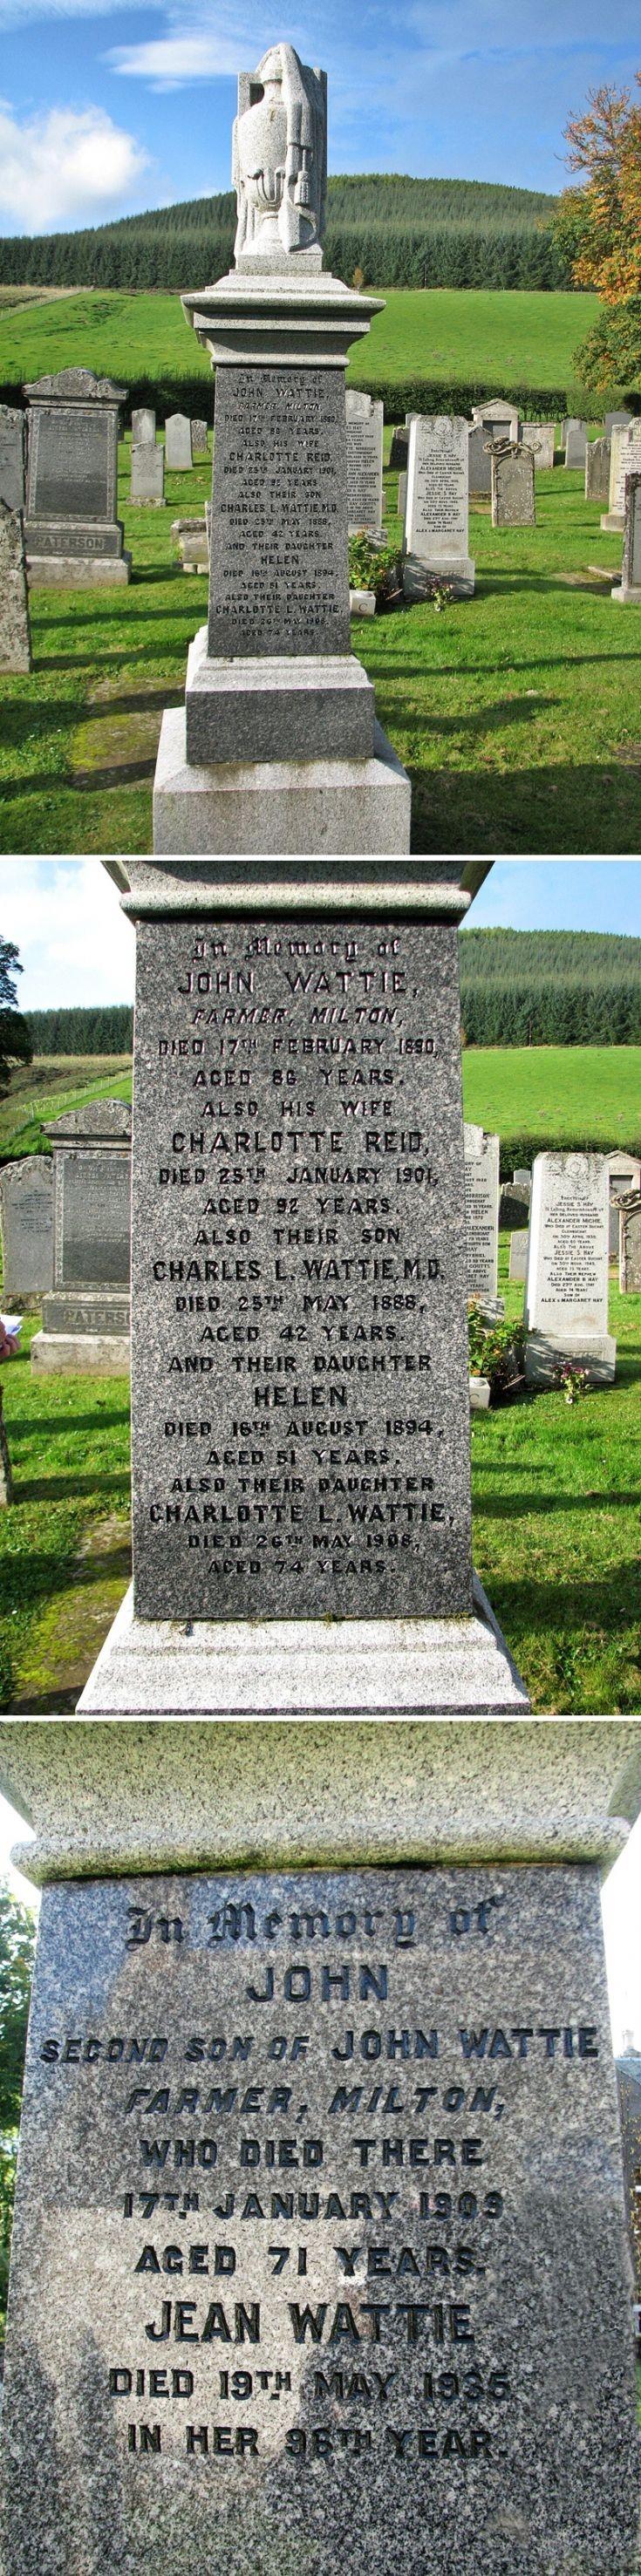 69 Grave No 88 John Wattie